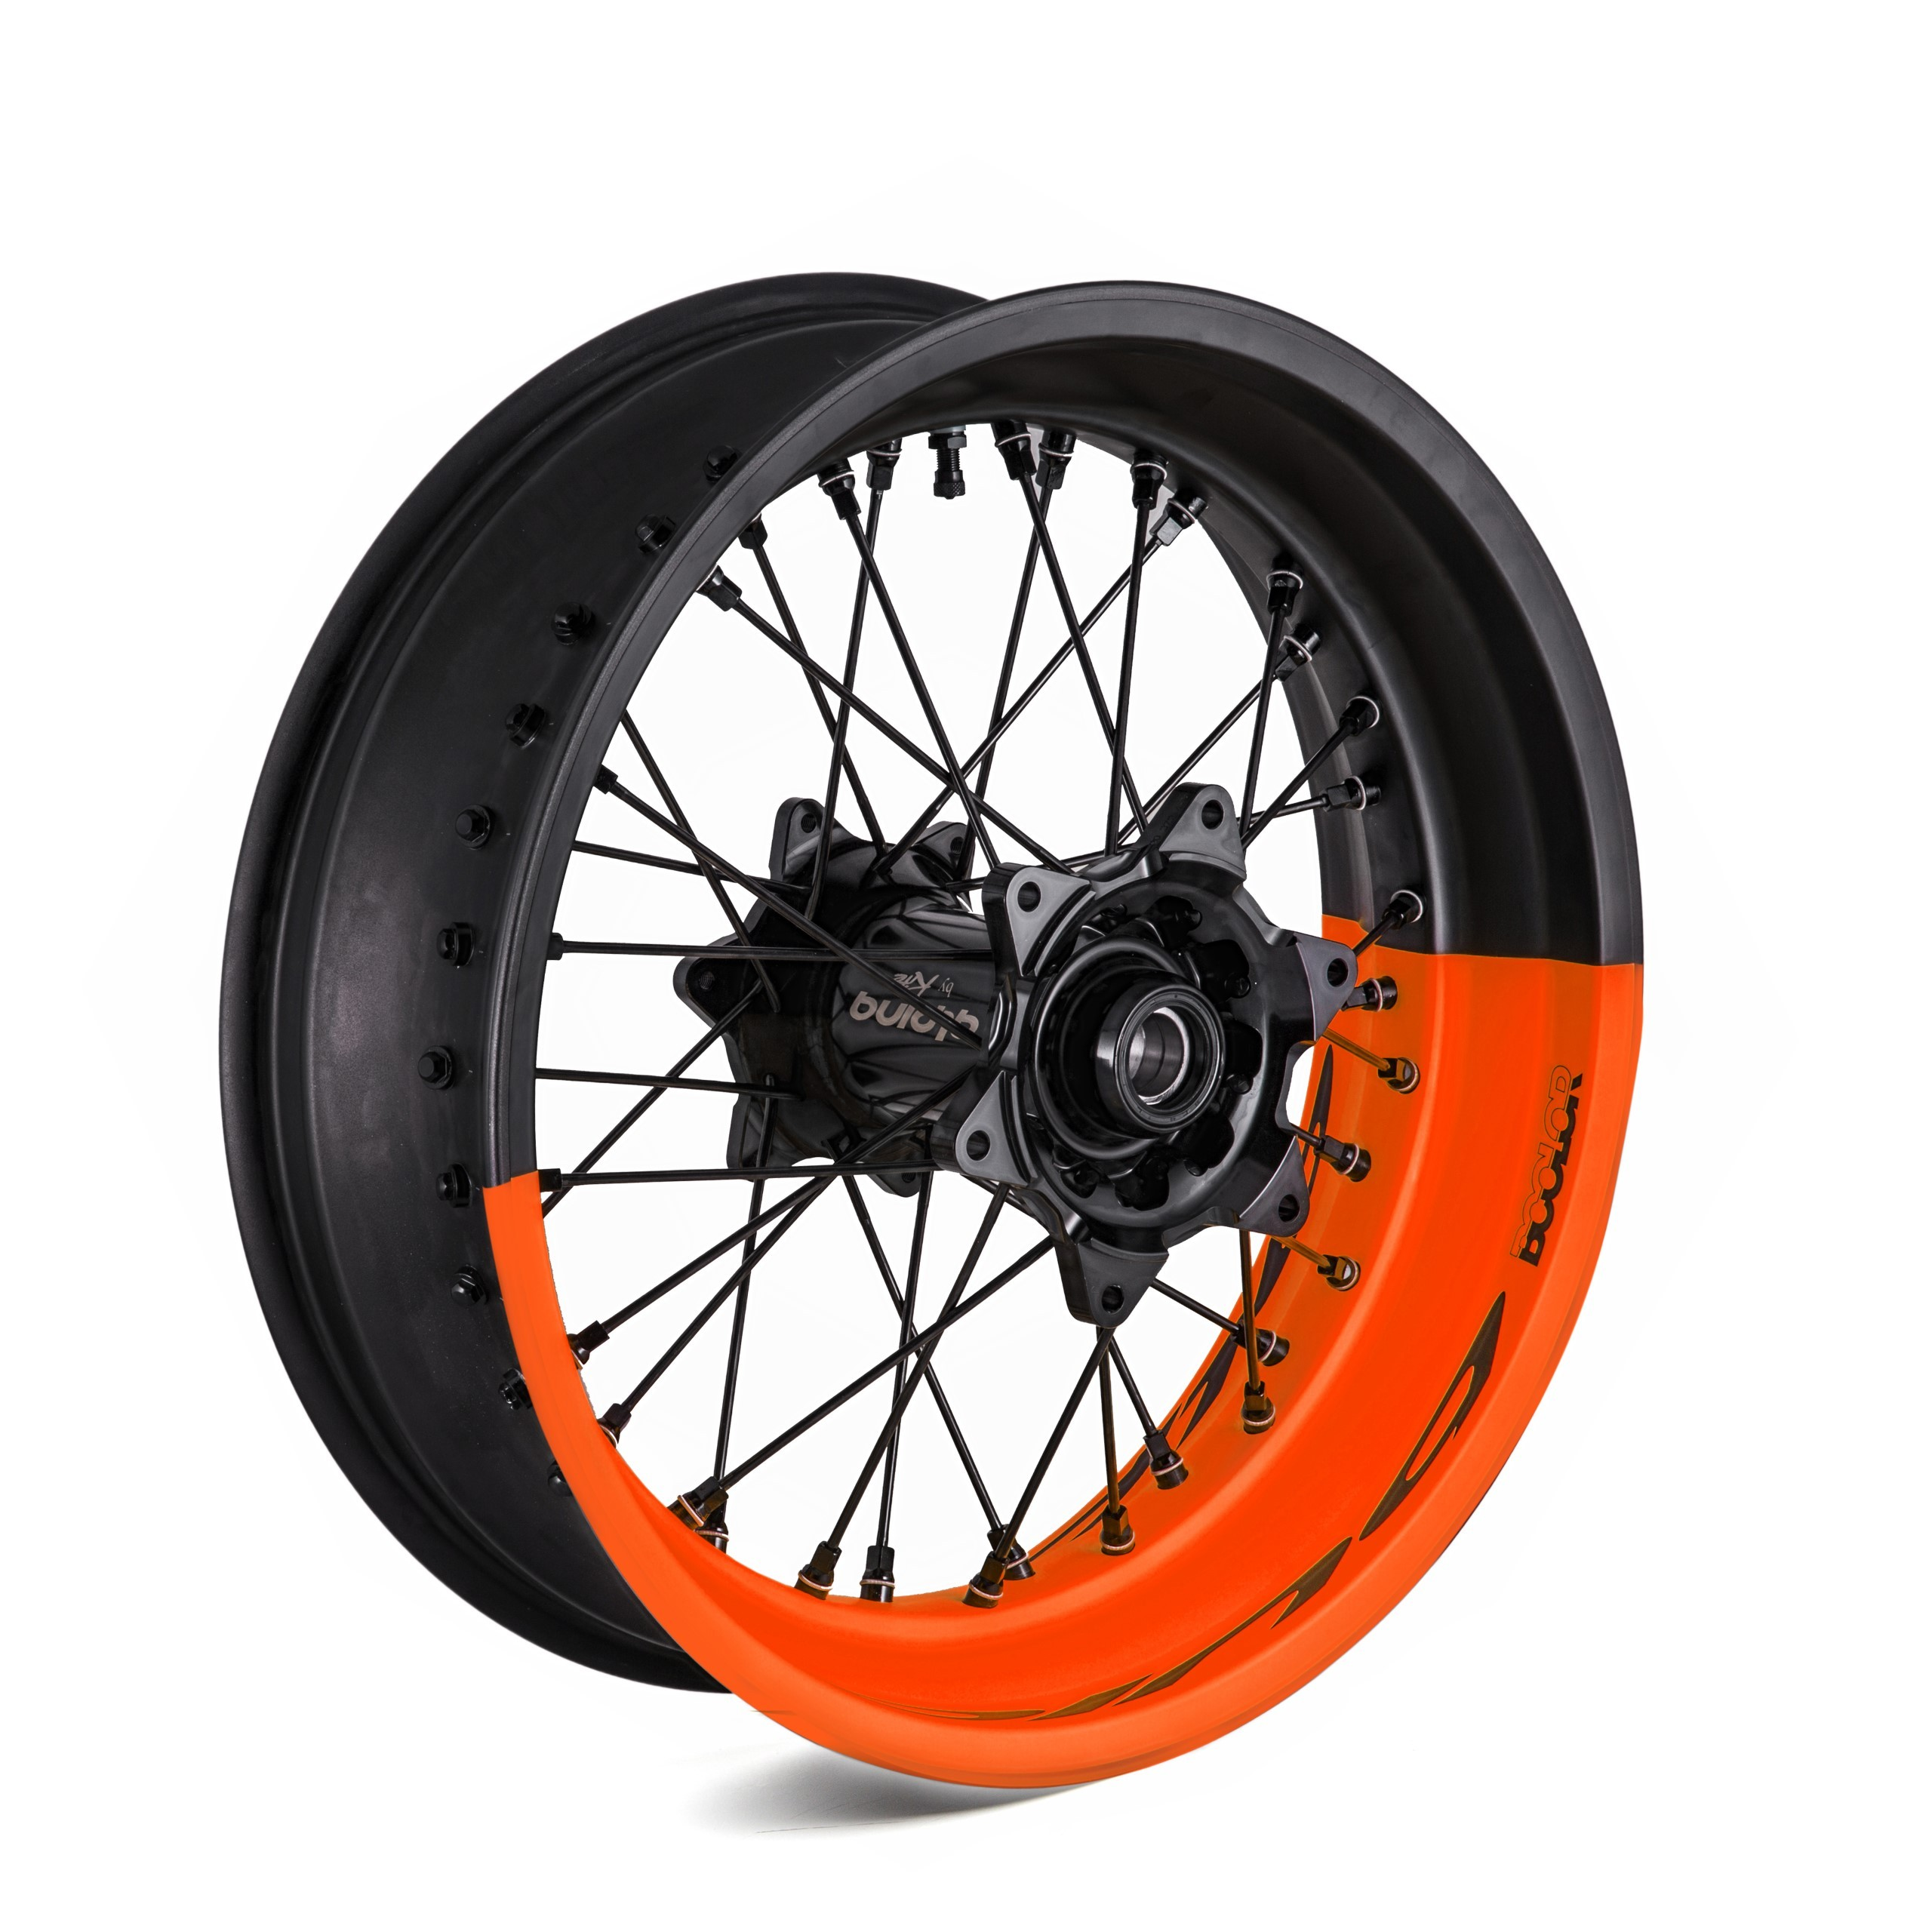 Supermoto Wheels & Tires